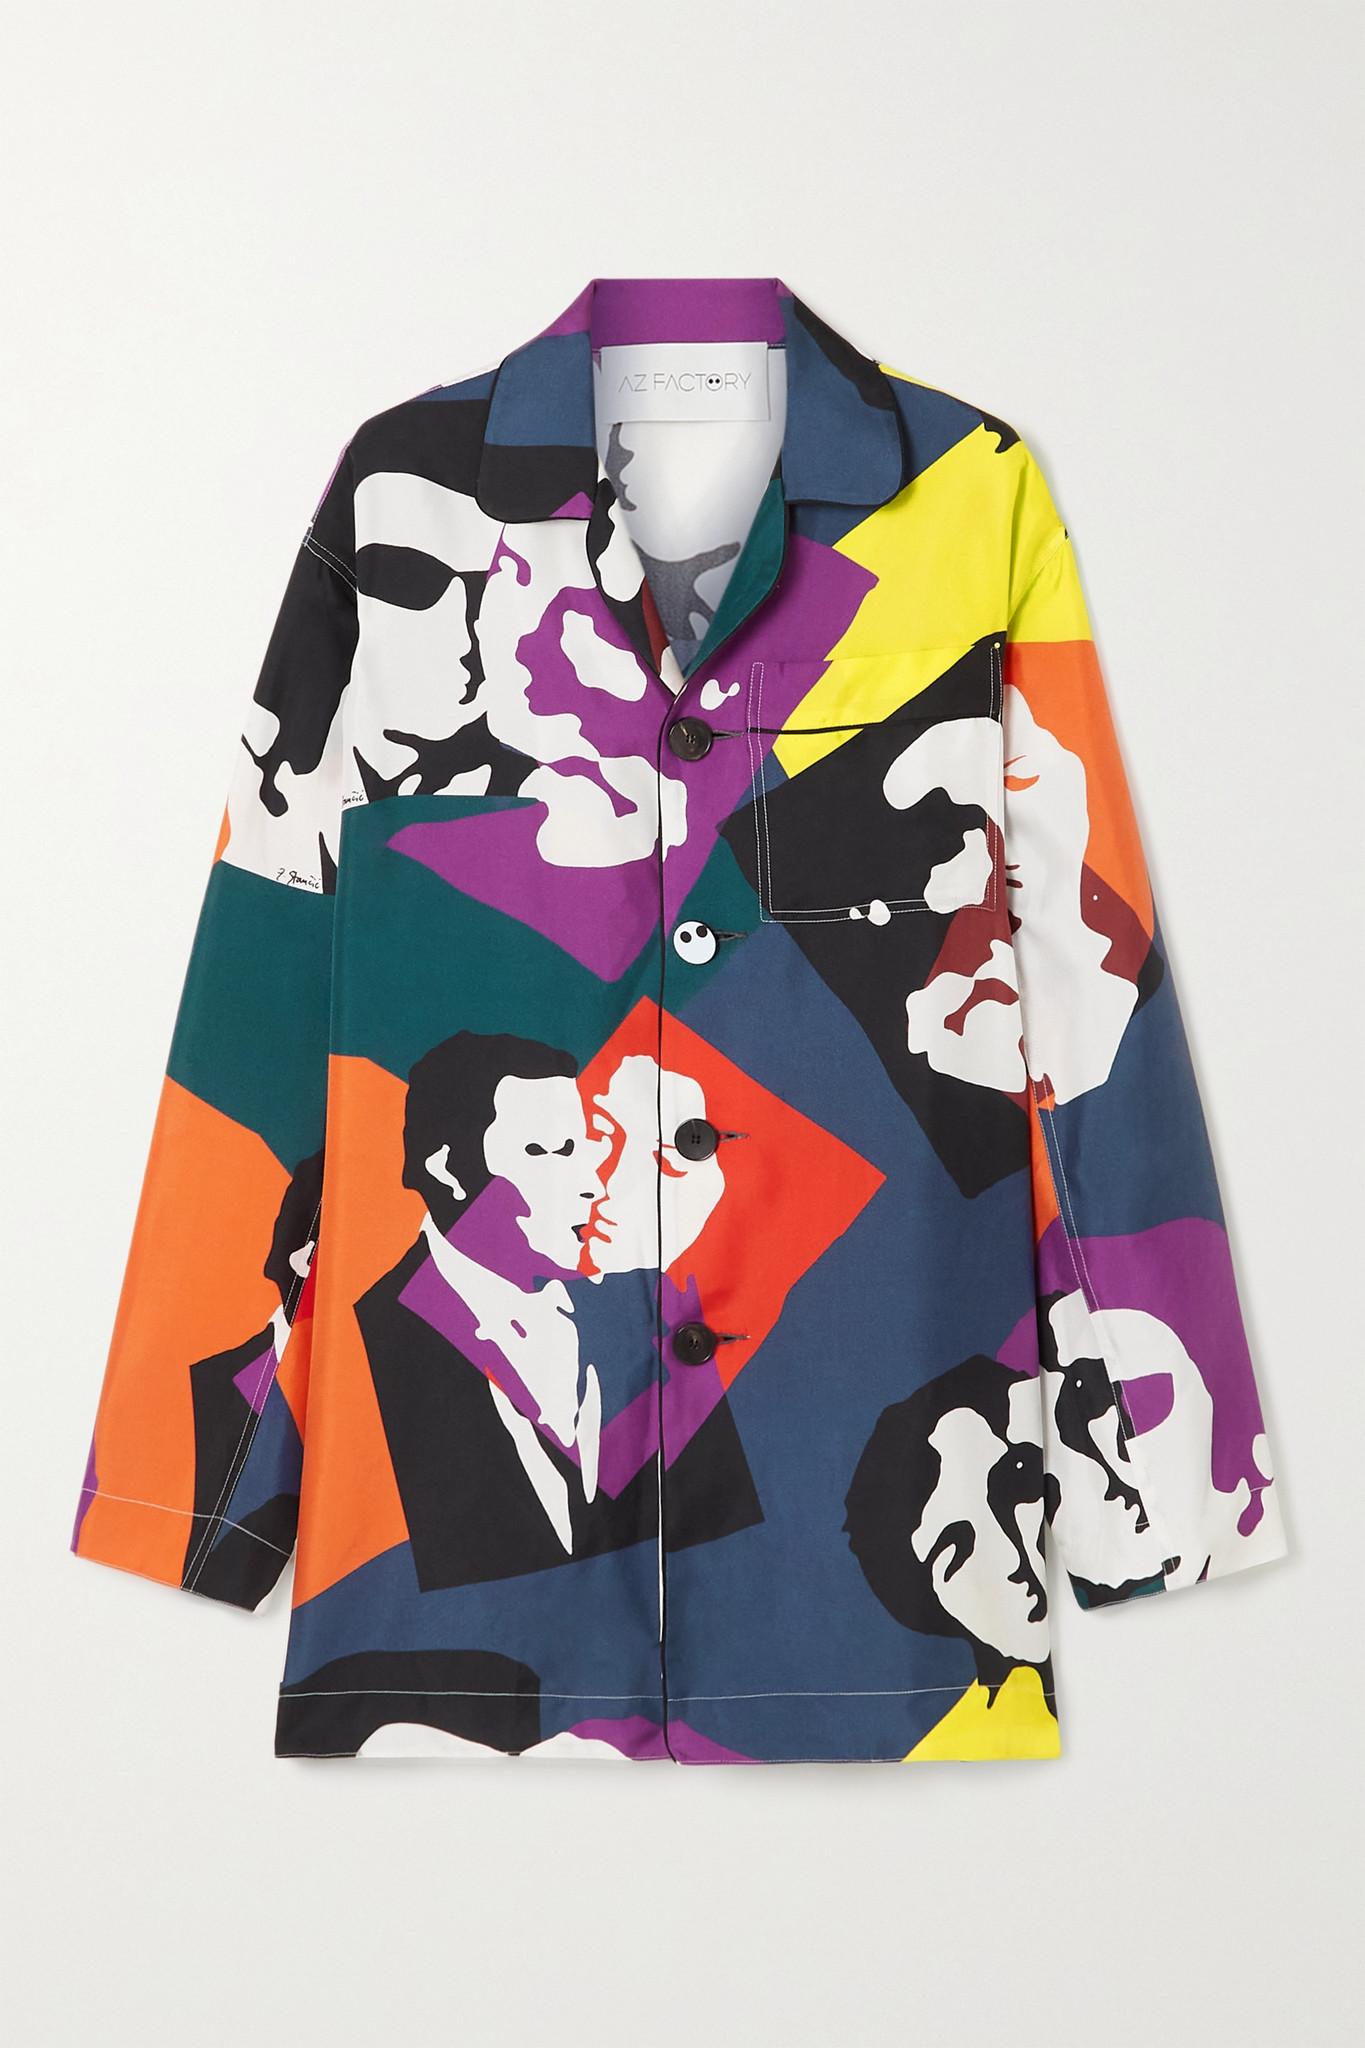 AZ FACTORY - Pijama The Kiss Printed Silk-twill Shirt - Black - FR32